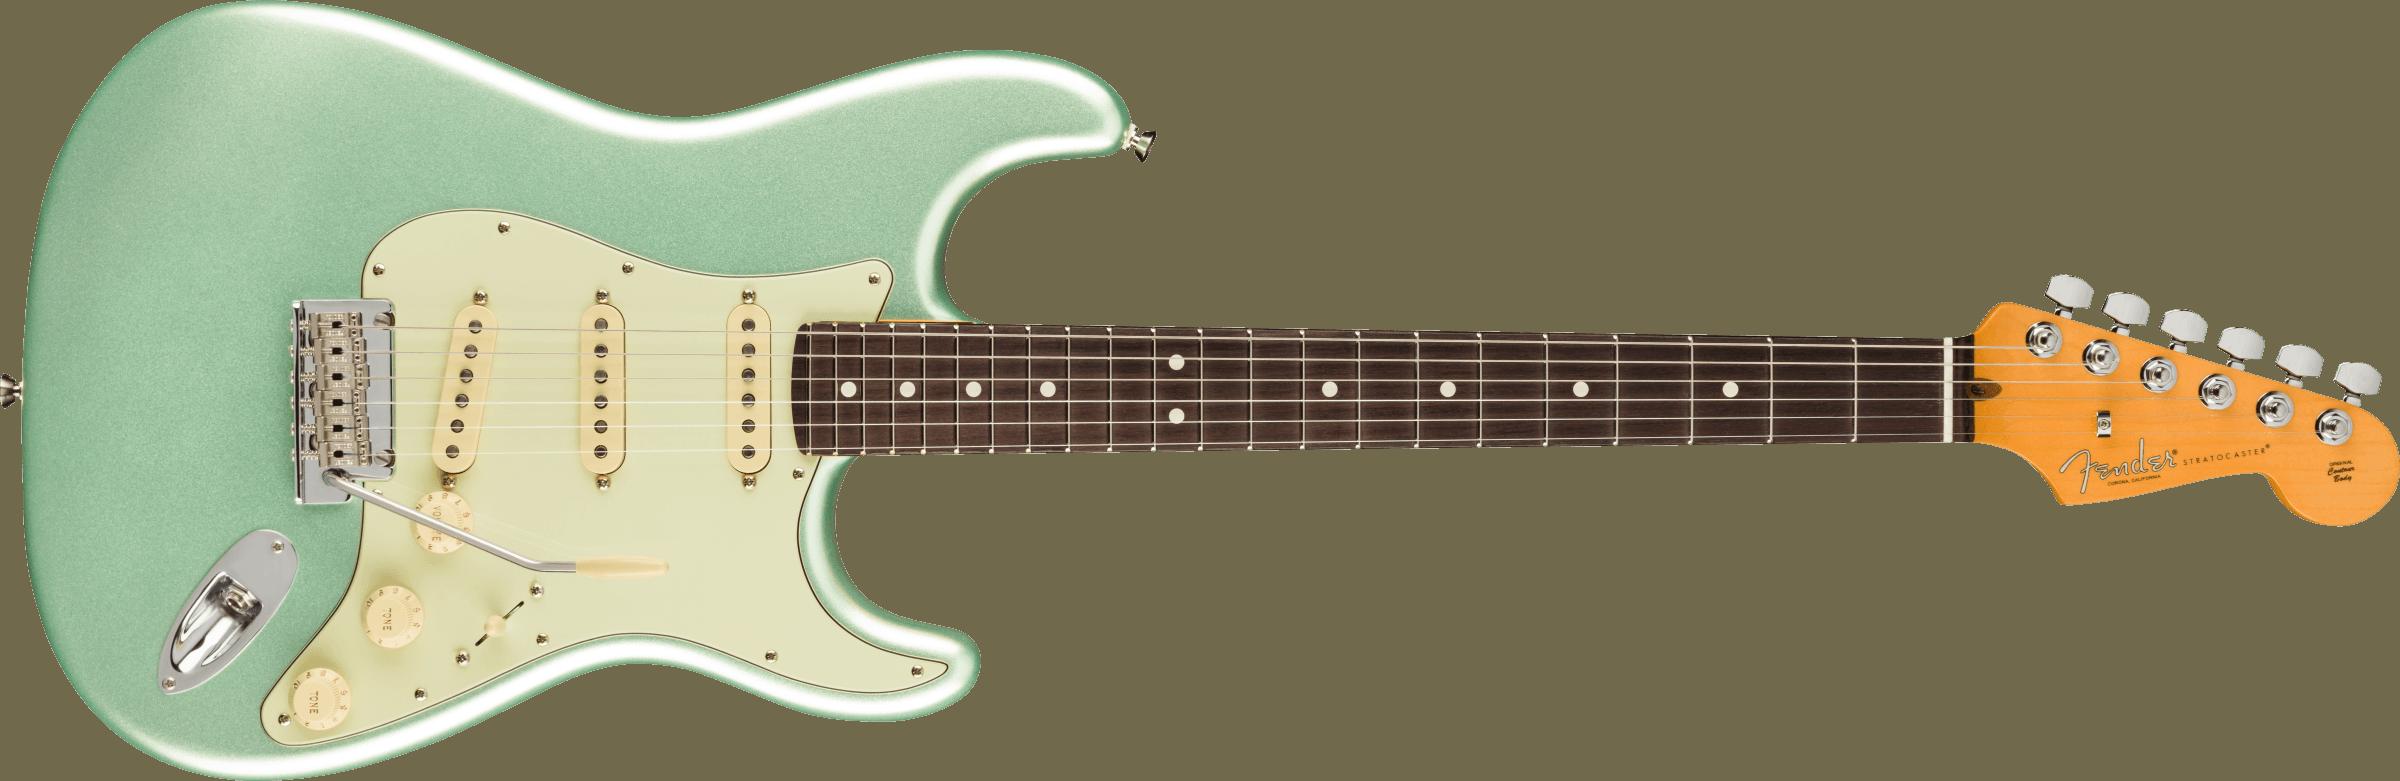 FENDER-American-Professional-II-Stratocaster-Rosewood-Fingerboard-Mystic-Surf-Green-sku-571005526